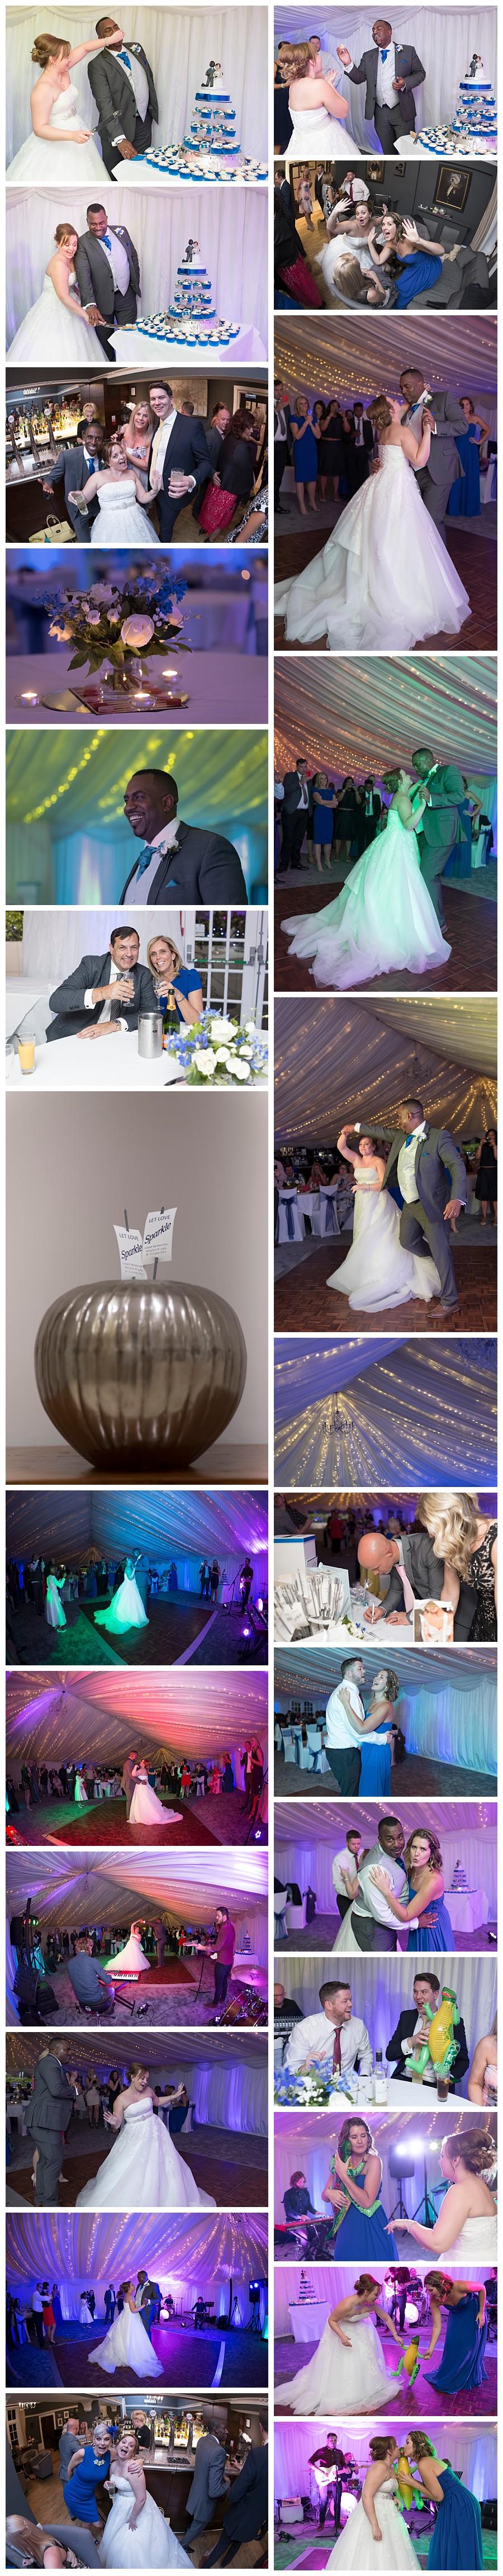 Wedding Photography Woodlands Hotel Leeds, evening reception photos woodlands hotel, marquee wedding photos Yorkshire woodlands hotel, first dance photos woodlands hotel